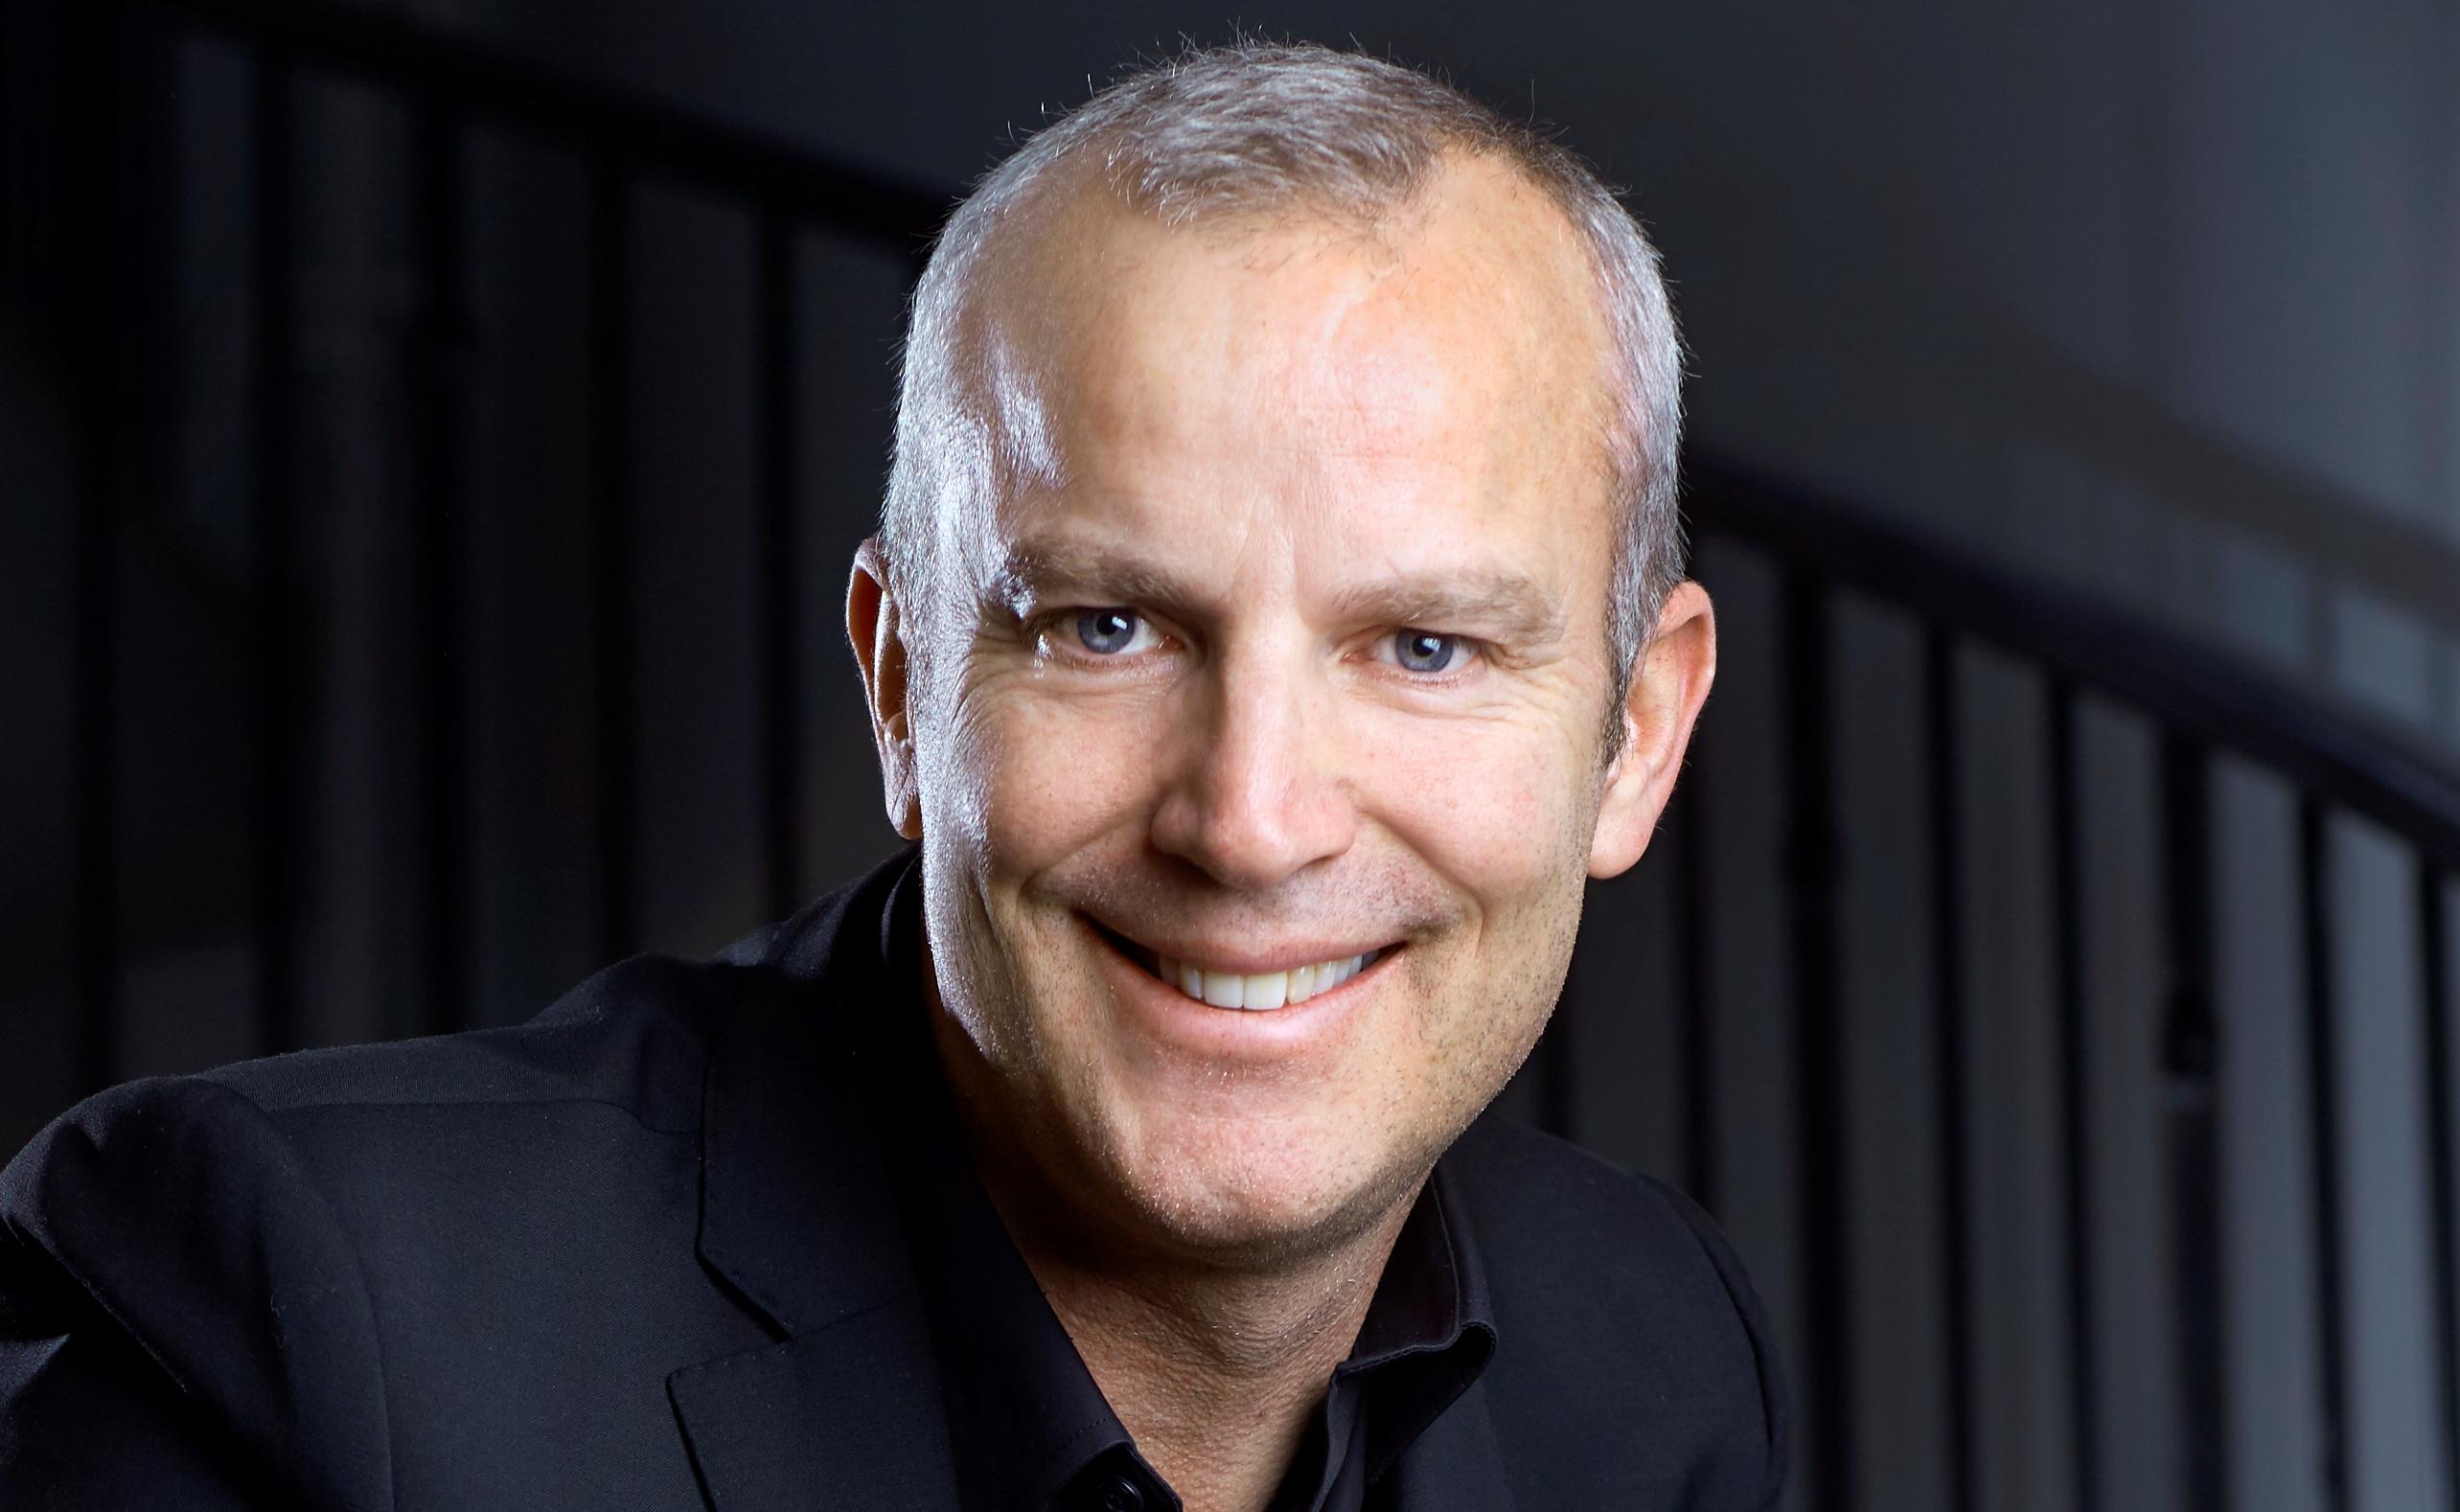 Thomas Engelhart, direktør for SAS Growth Initiaitve. (Foto: SAS AB)